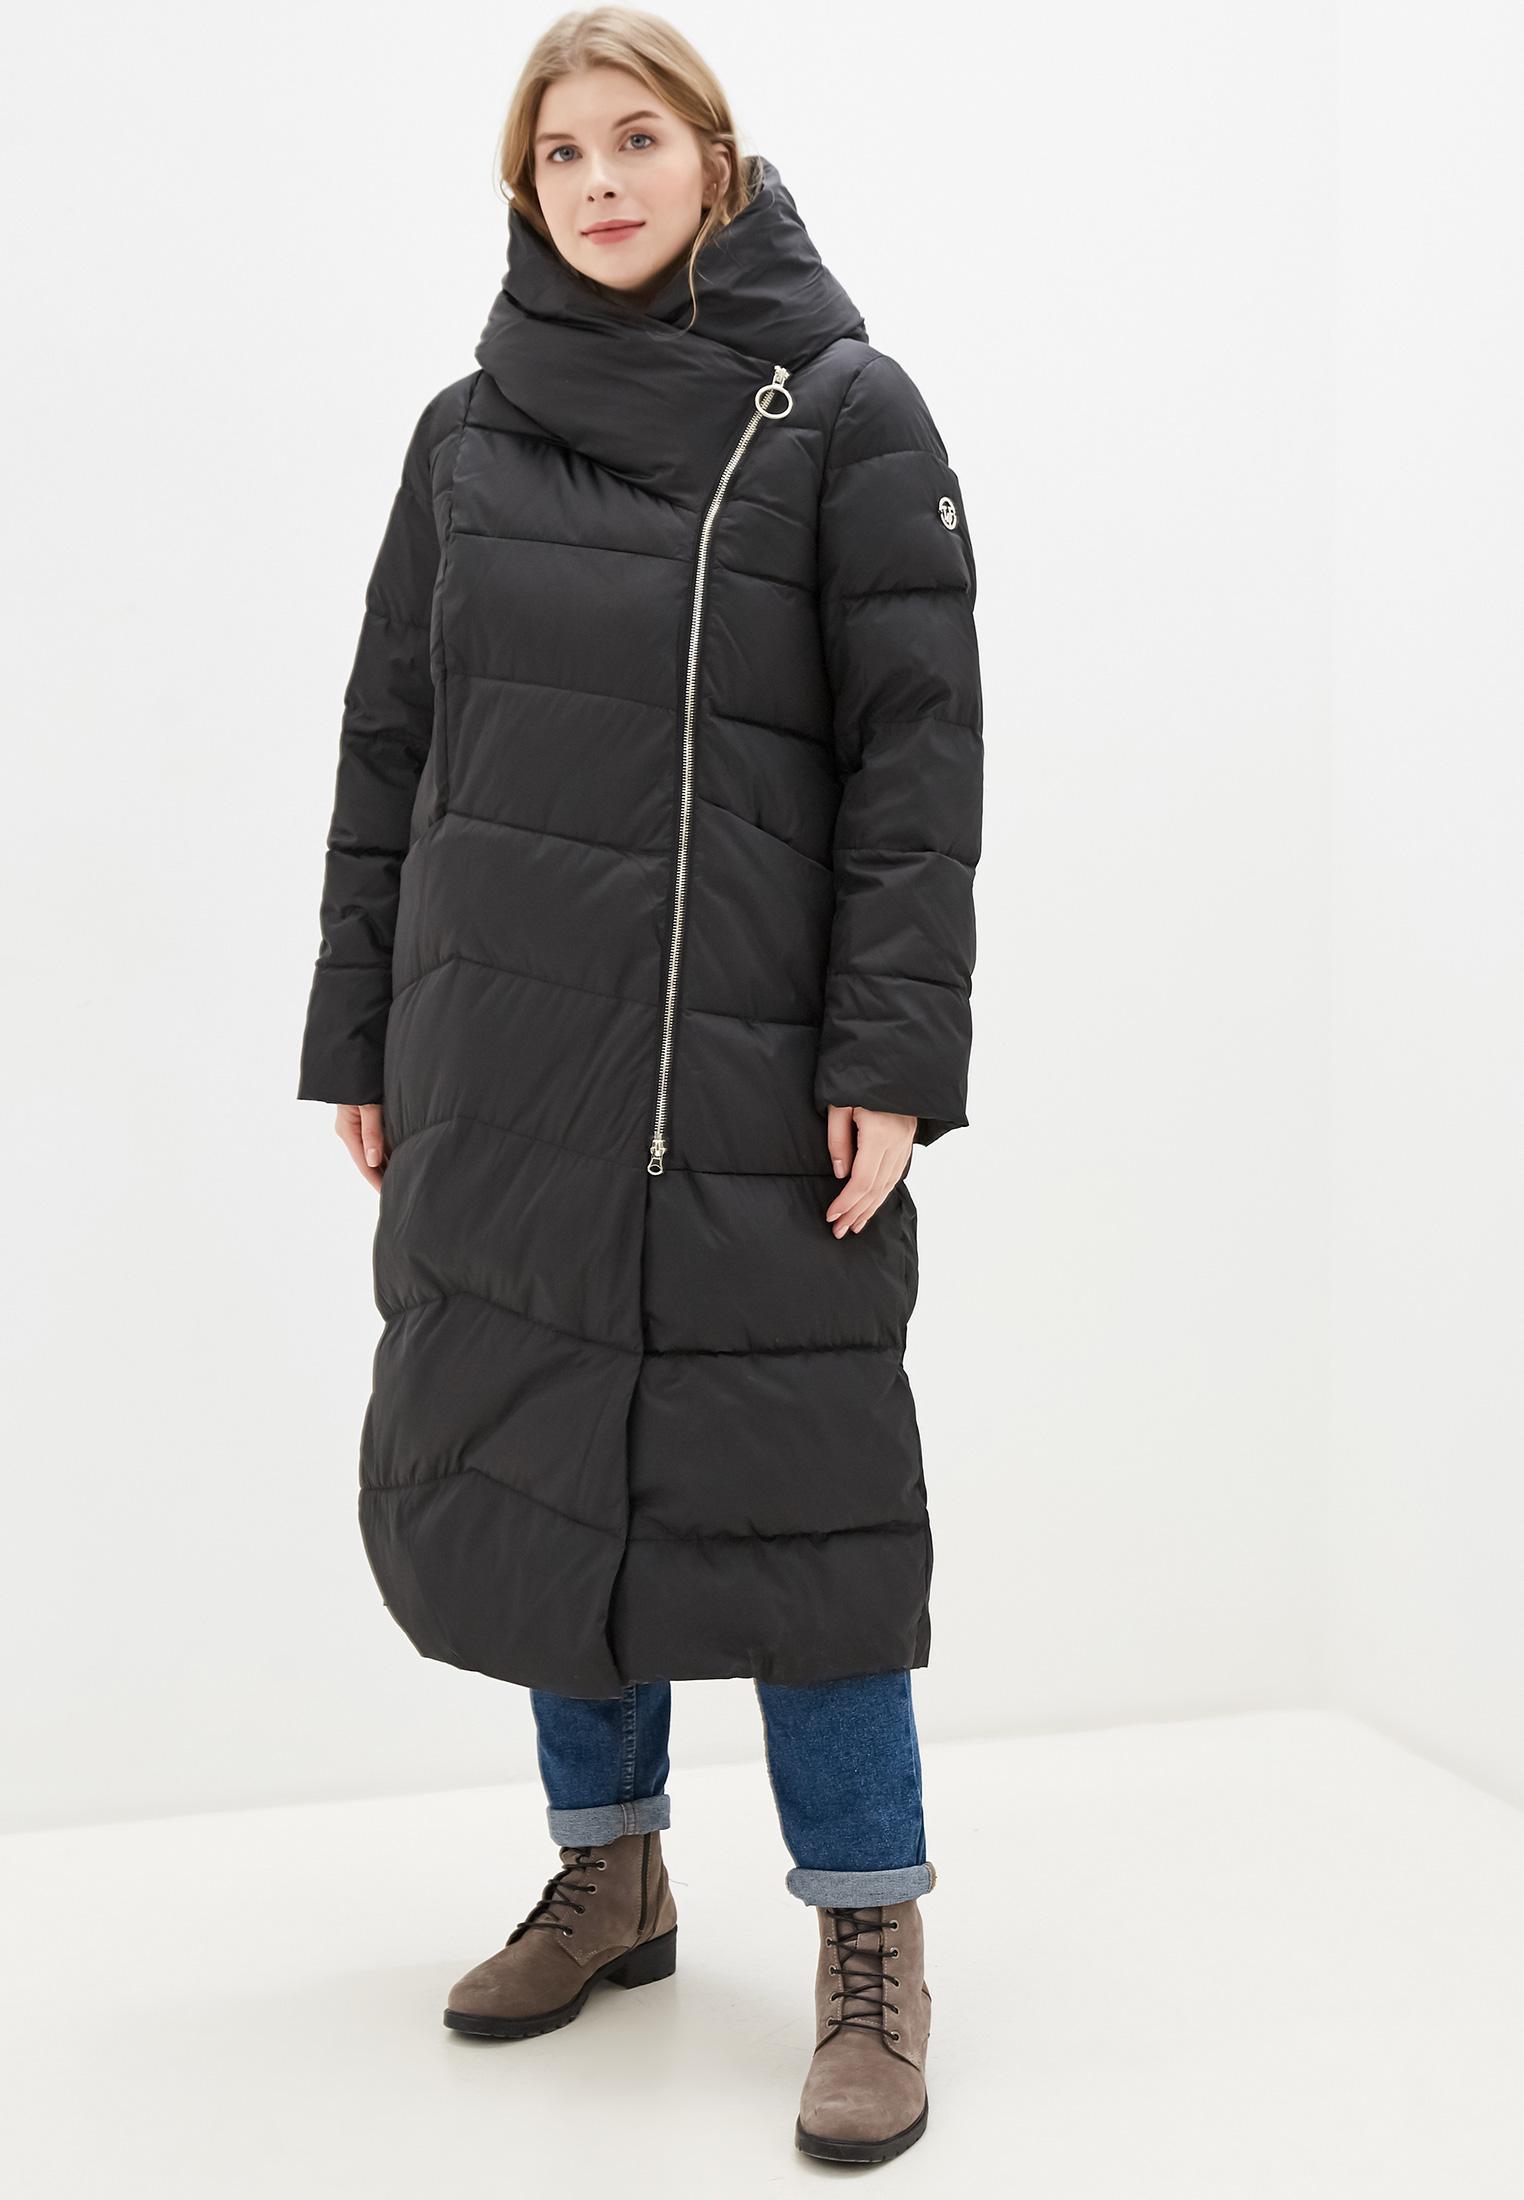 Куртка утепленная, Tom Farr, цвет: черный. Артикул: MP002XW1F220. Одежда / Верхняя одежда